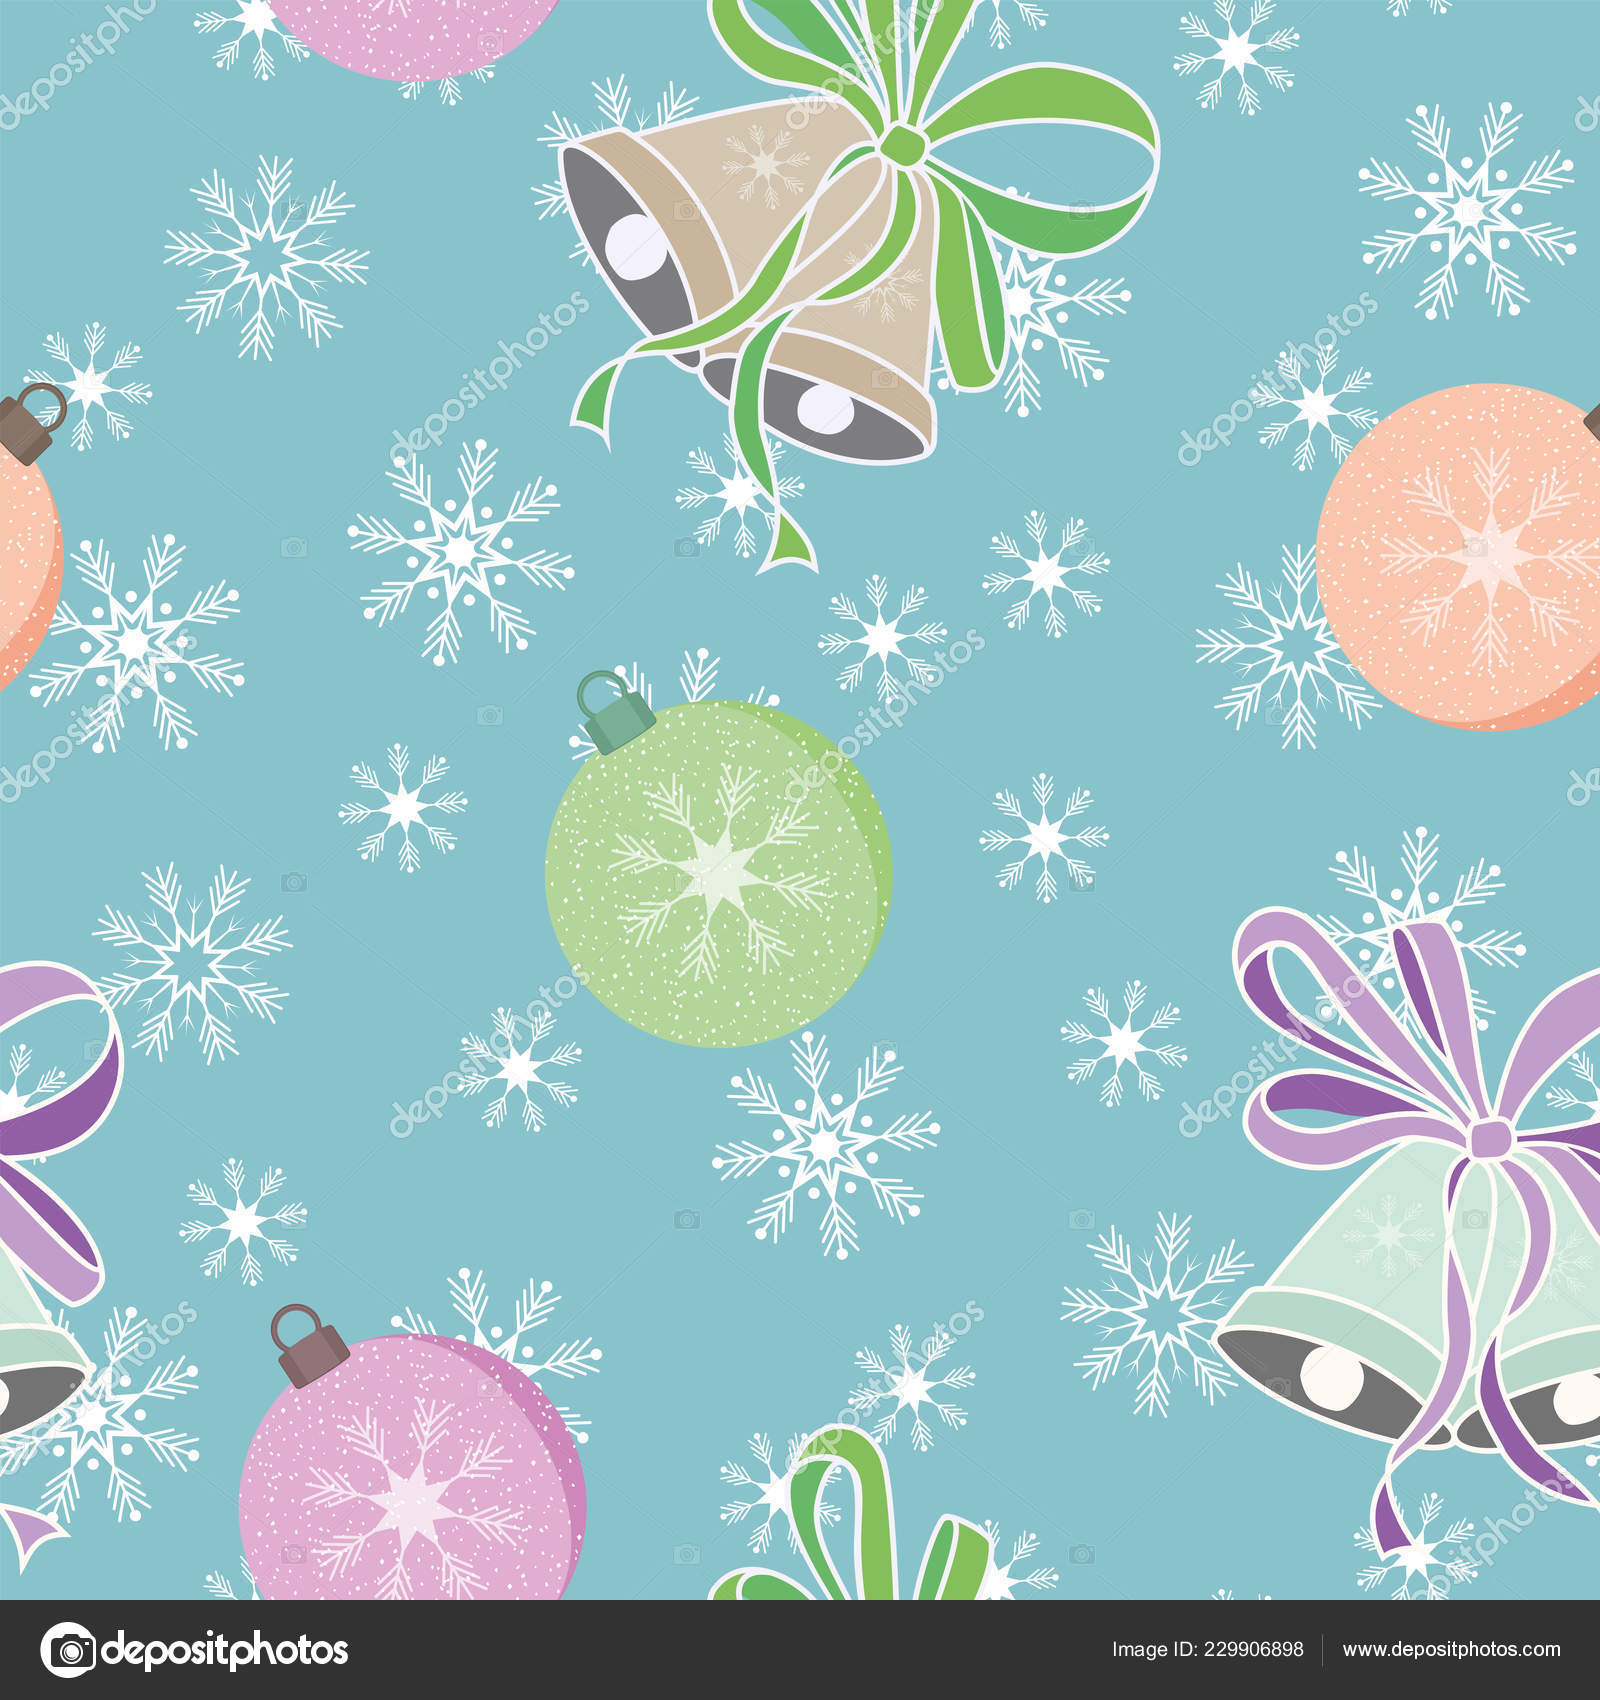 depositphotos 229906898 stock illustration christmas milticolor balls bells seamless